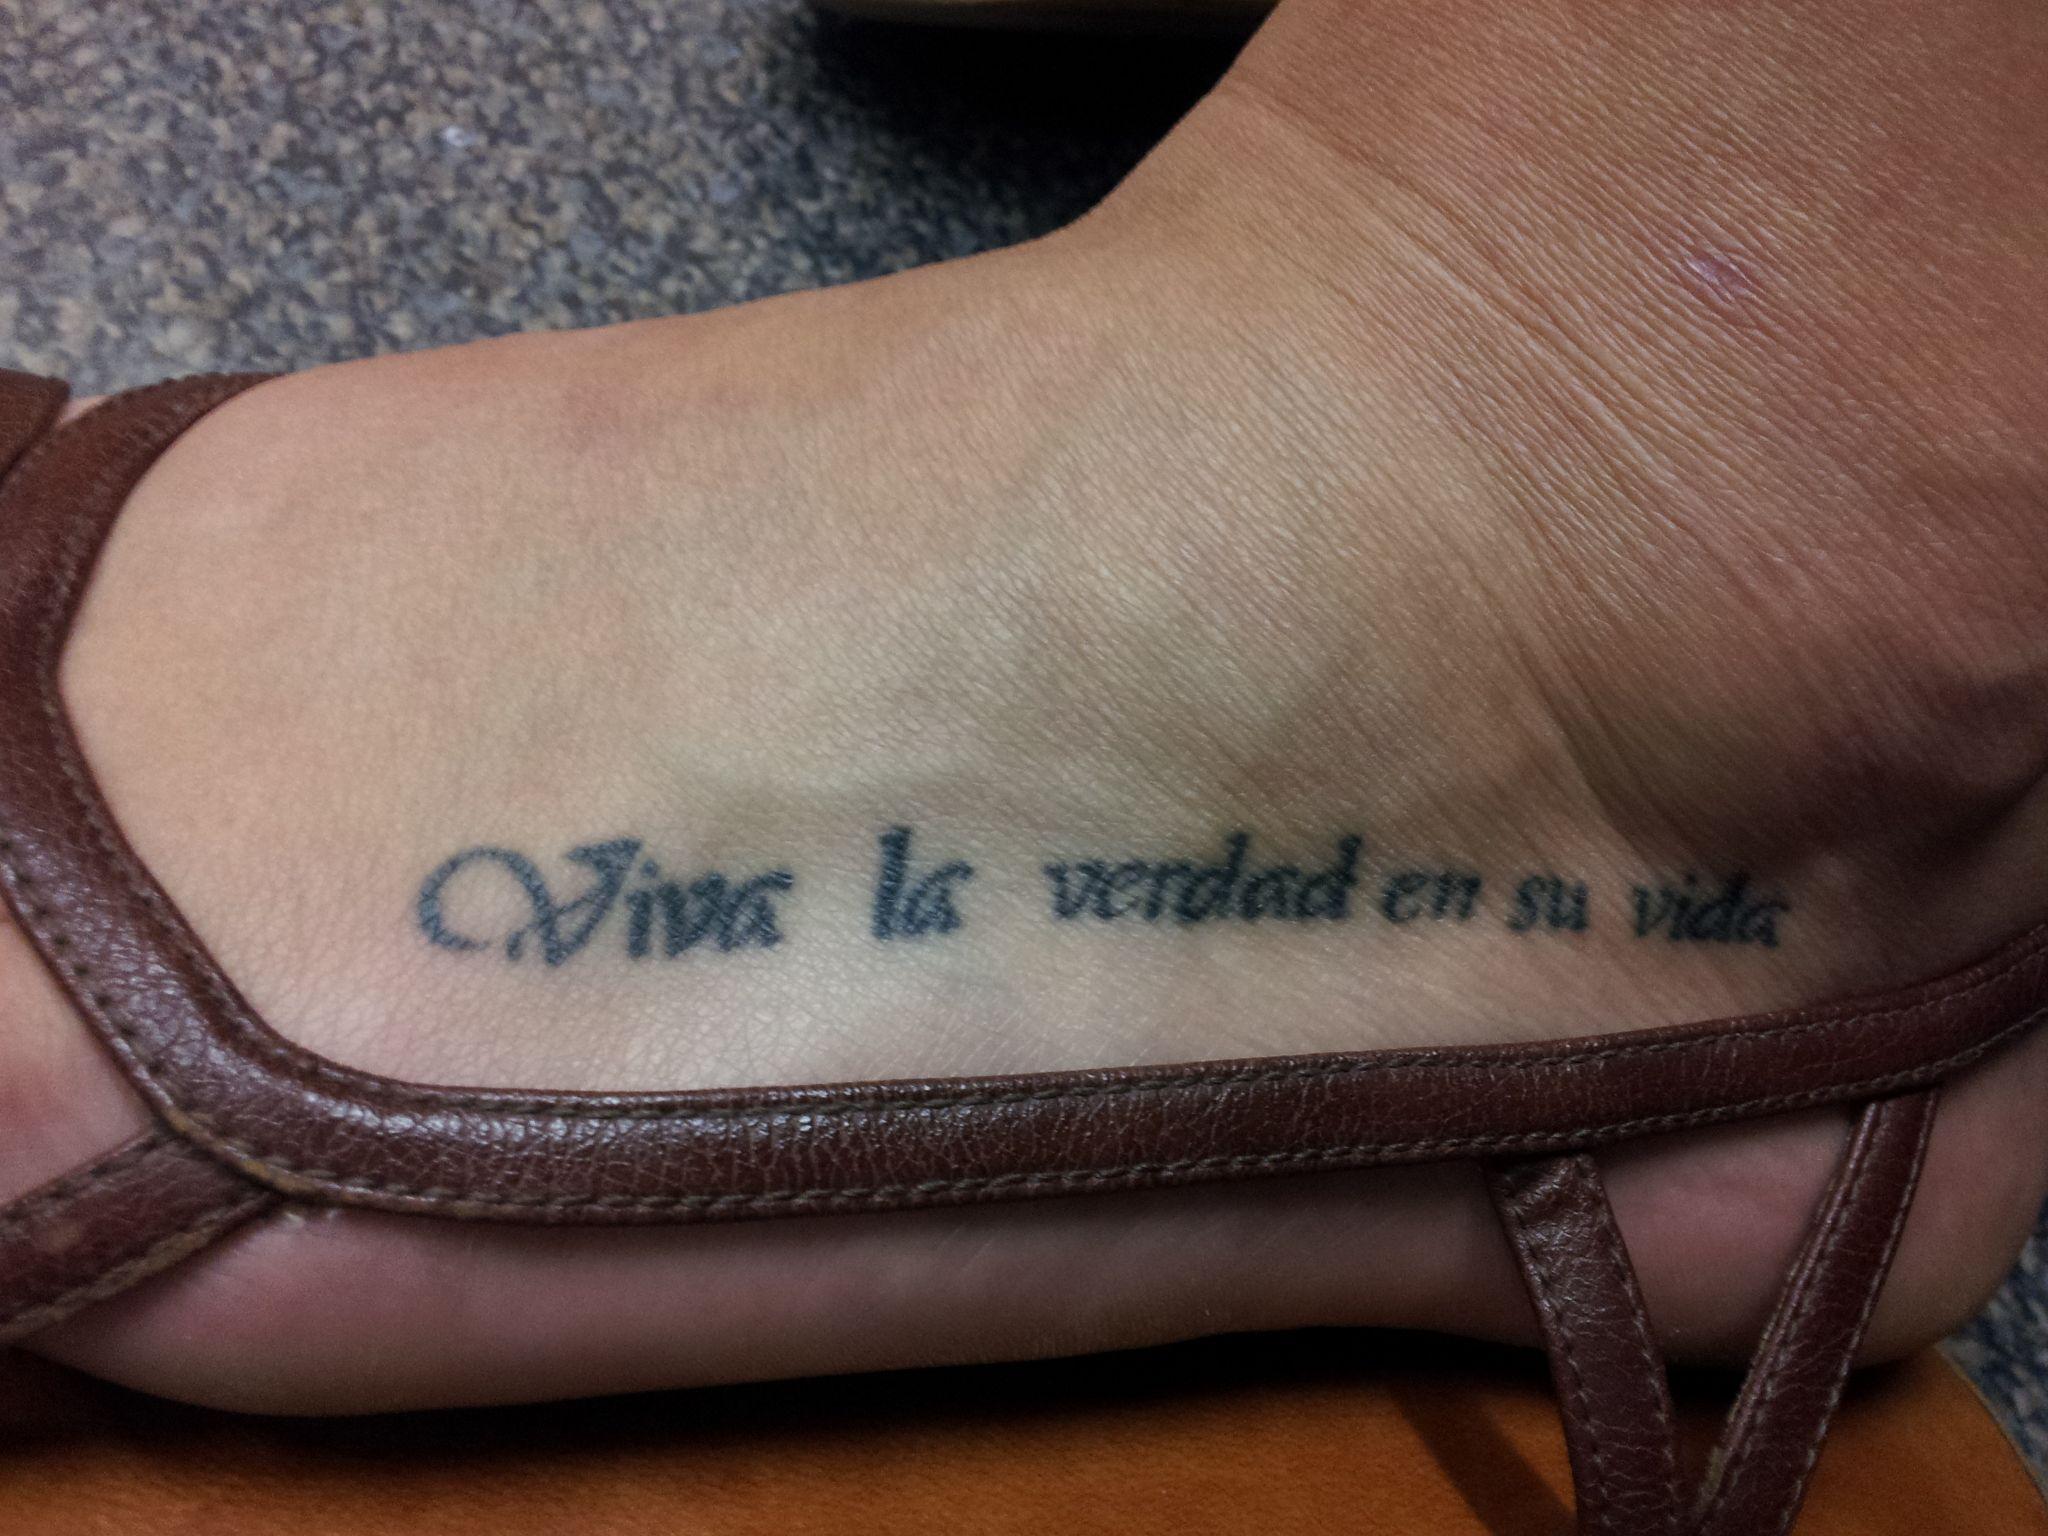 2nd tattoo in spanish viva la verdad en su vida for Tattoo in spanish